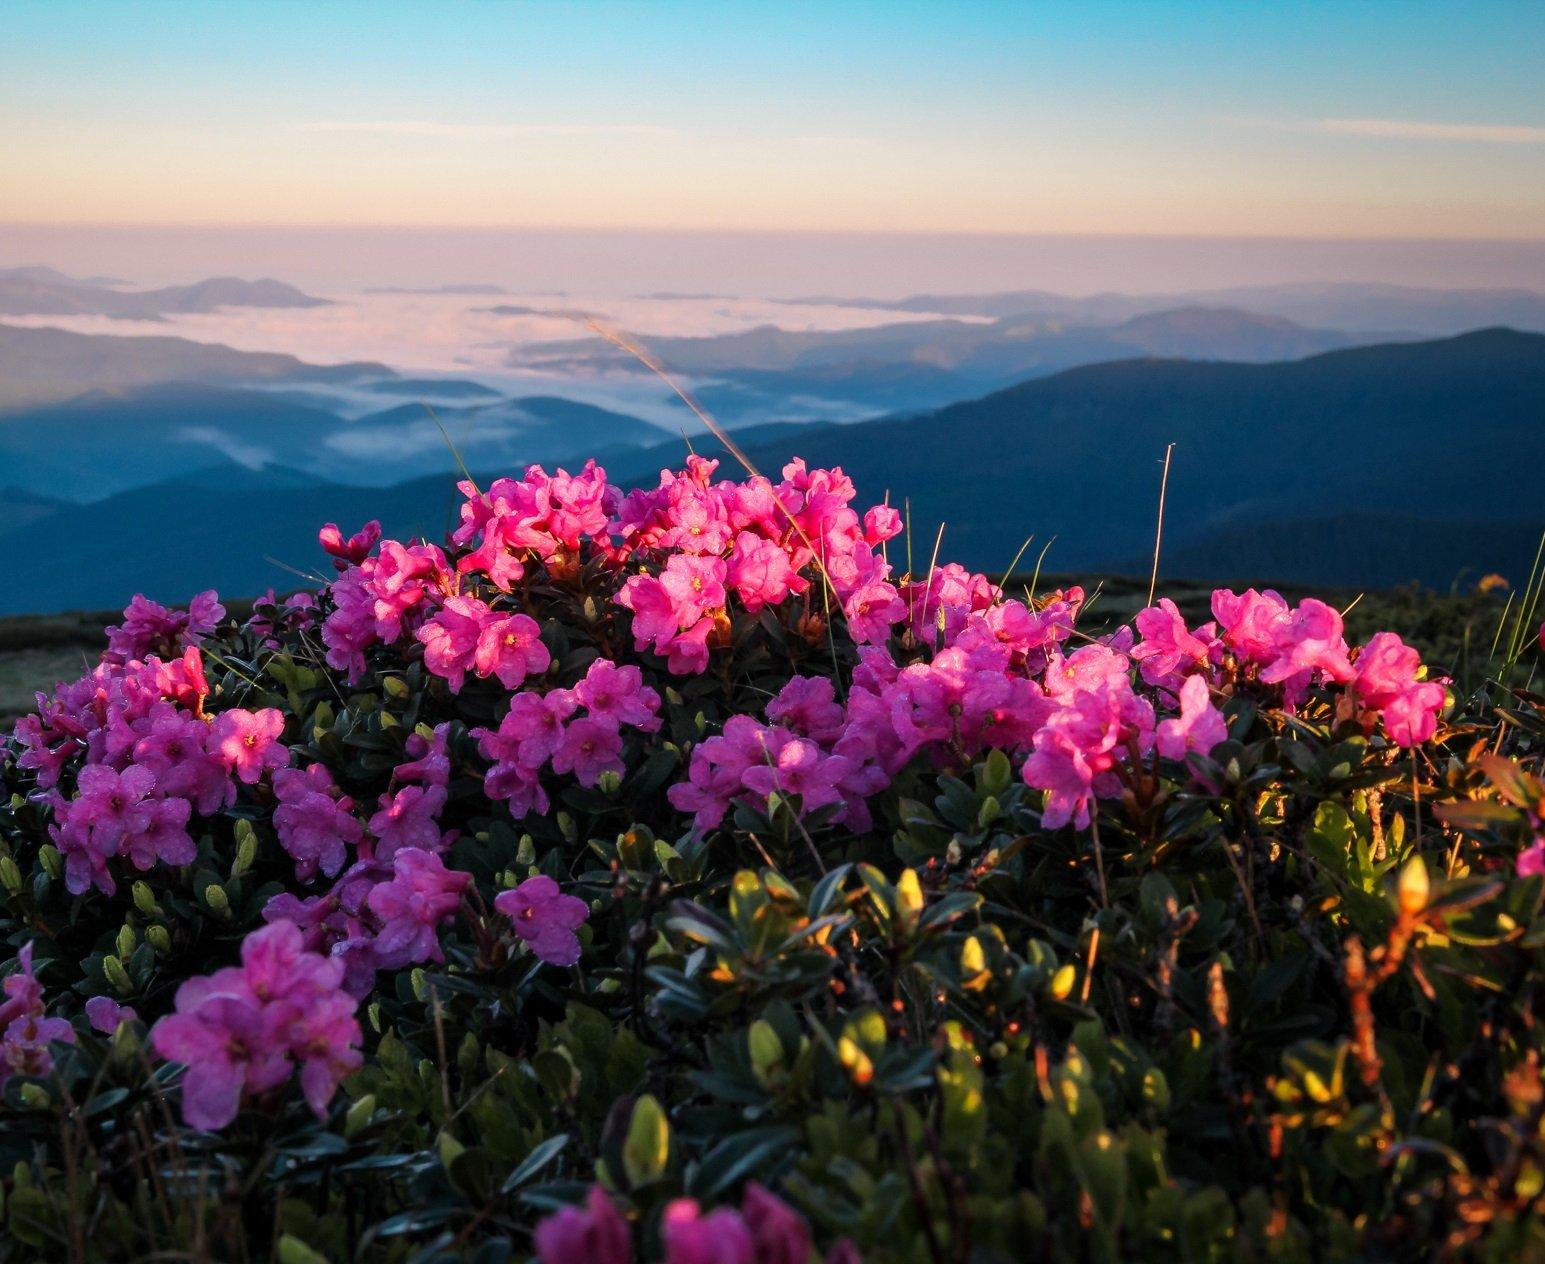 Незабутня краса: в Карпатах розцвіли рододендрони - легендарна червона рута